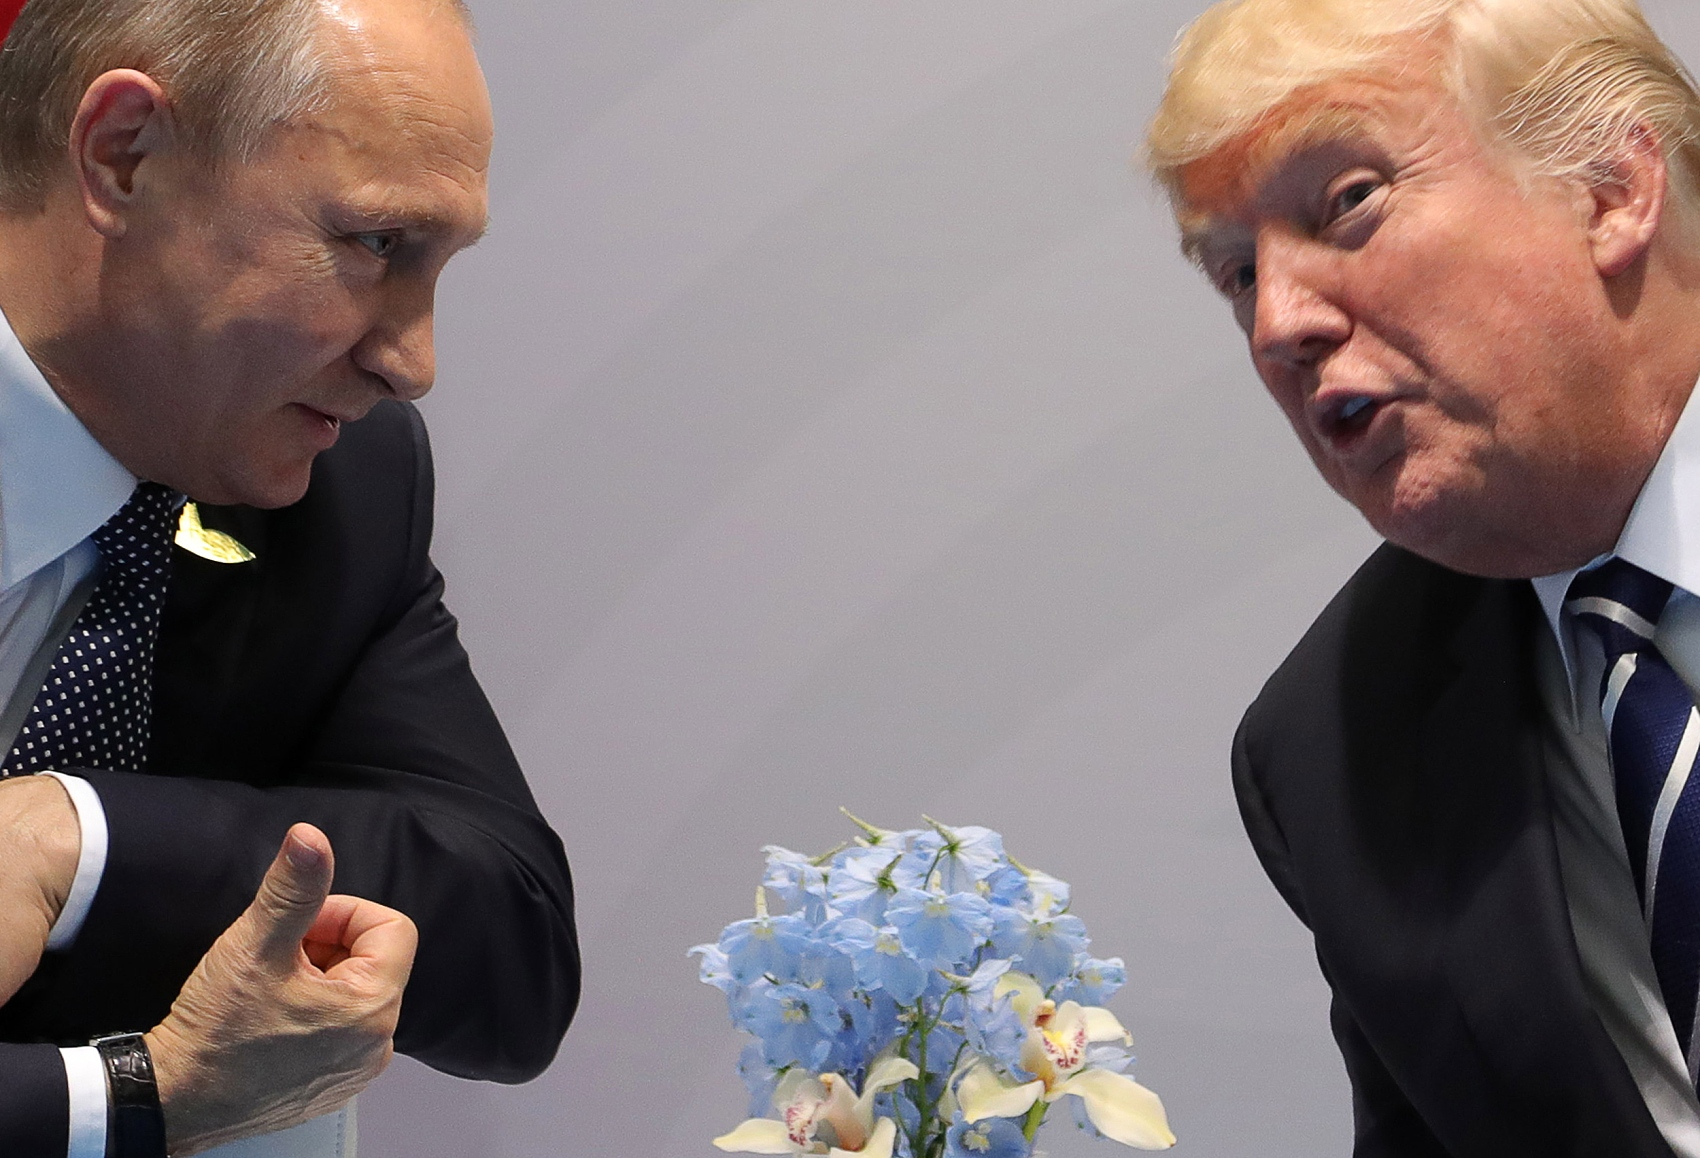 Putin, Trump to meet in Vietnam Friday